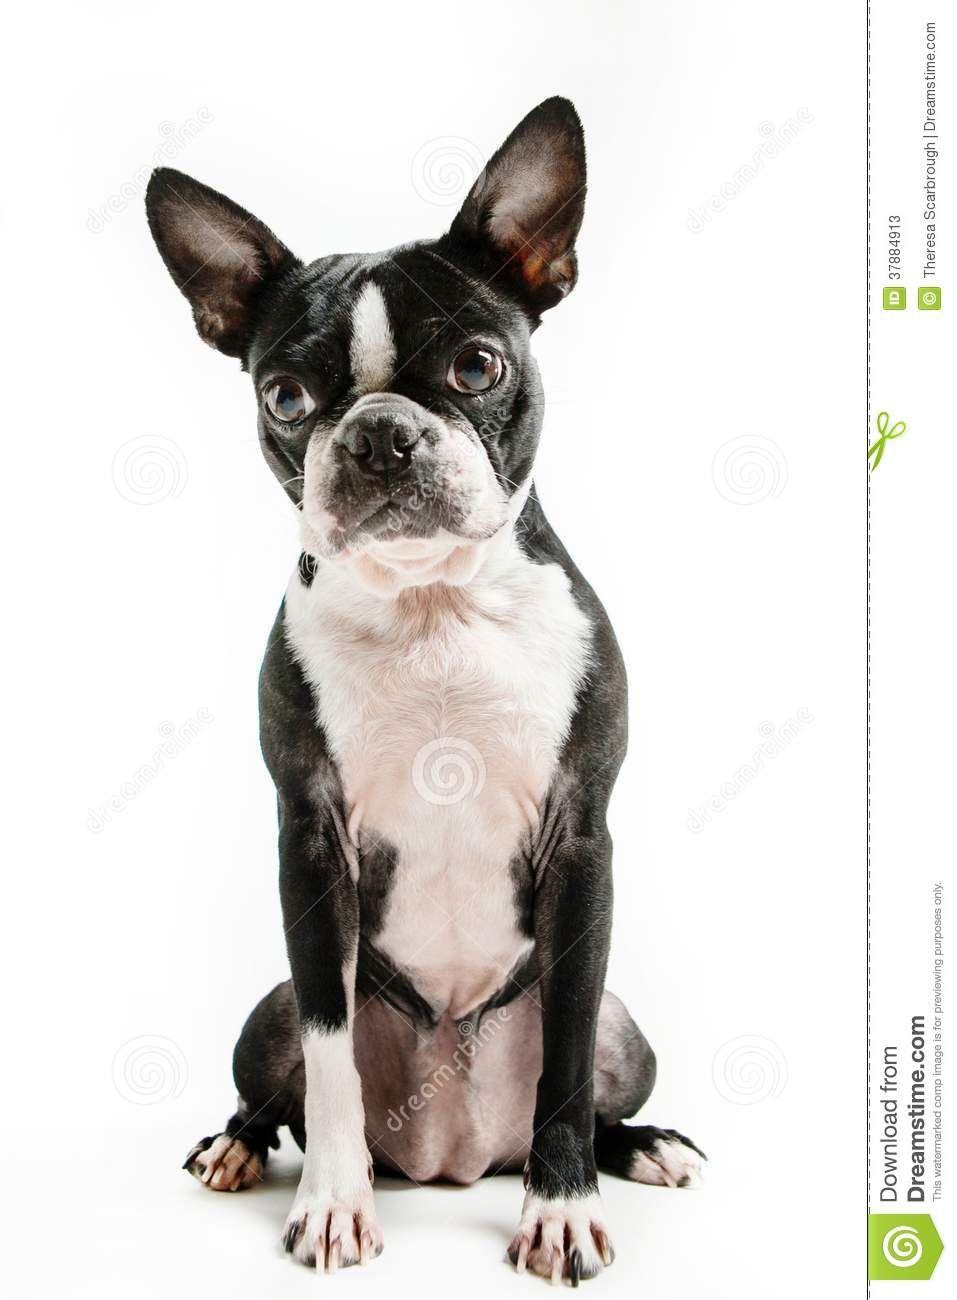 Boston Terrier Sitting Google Search Animals Images Boston Terrier Animals